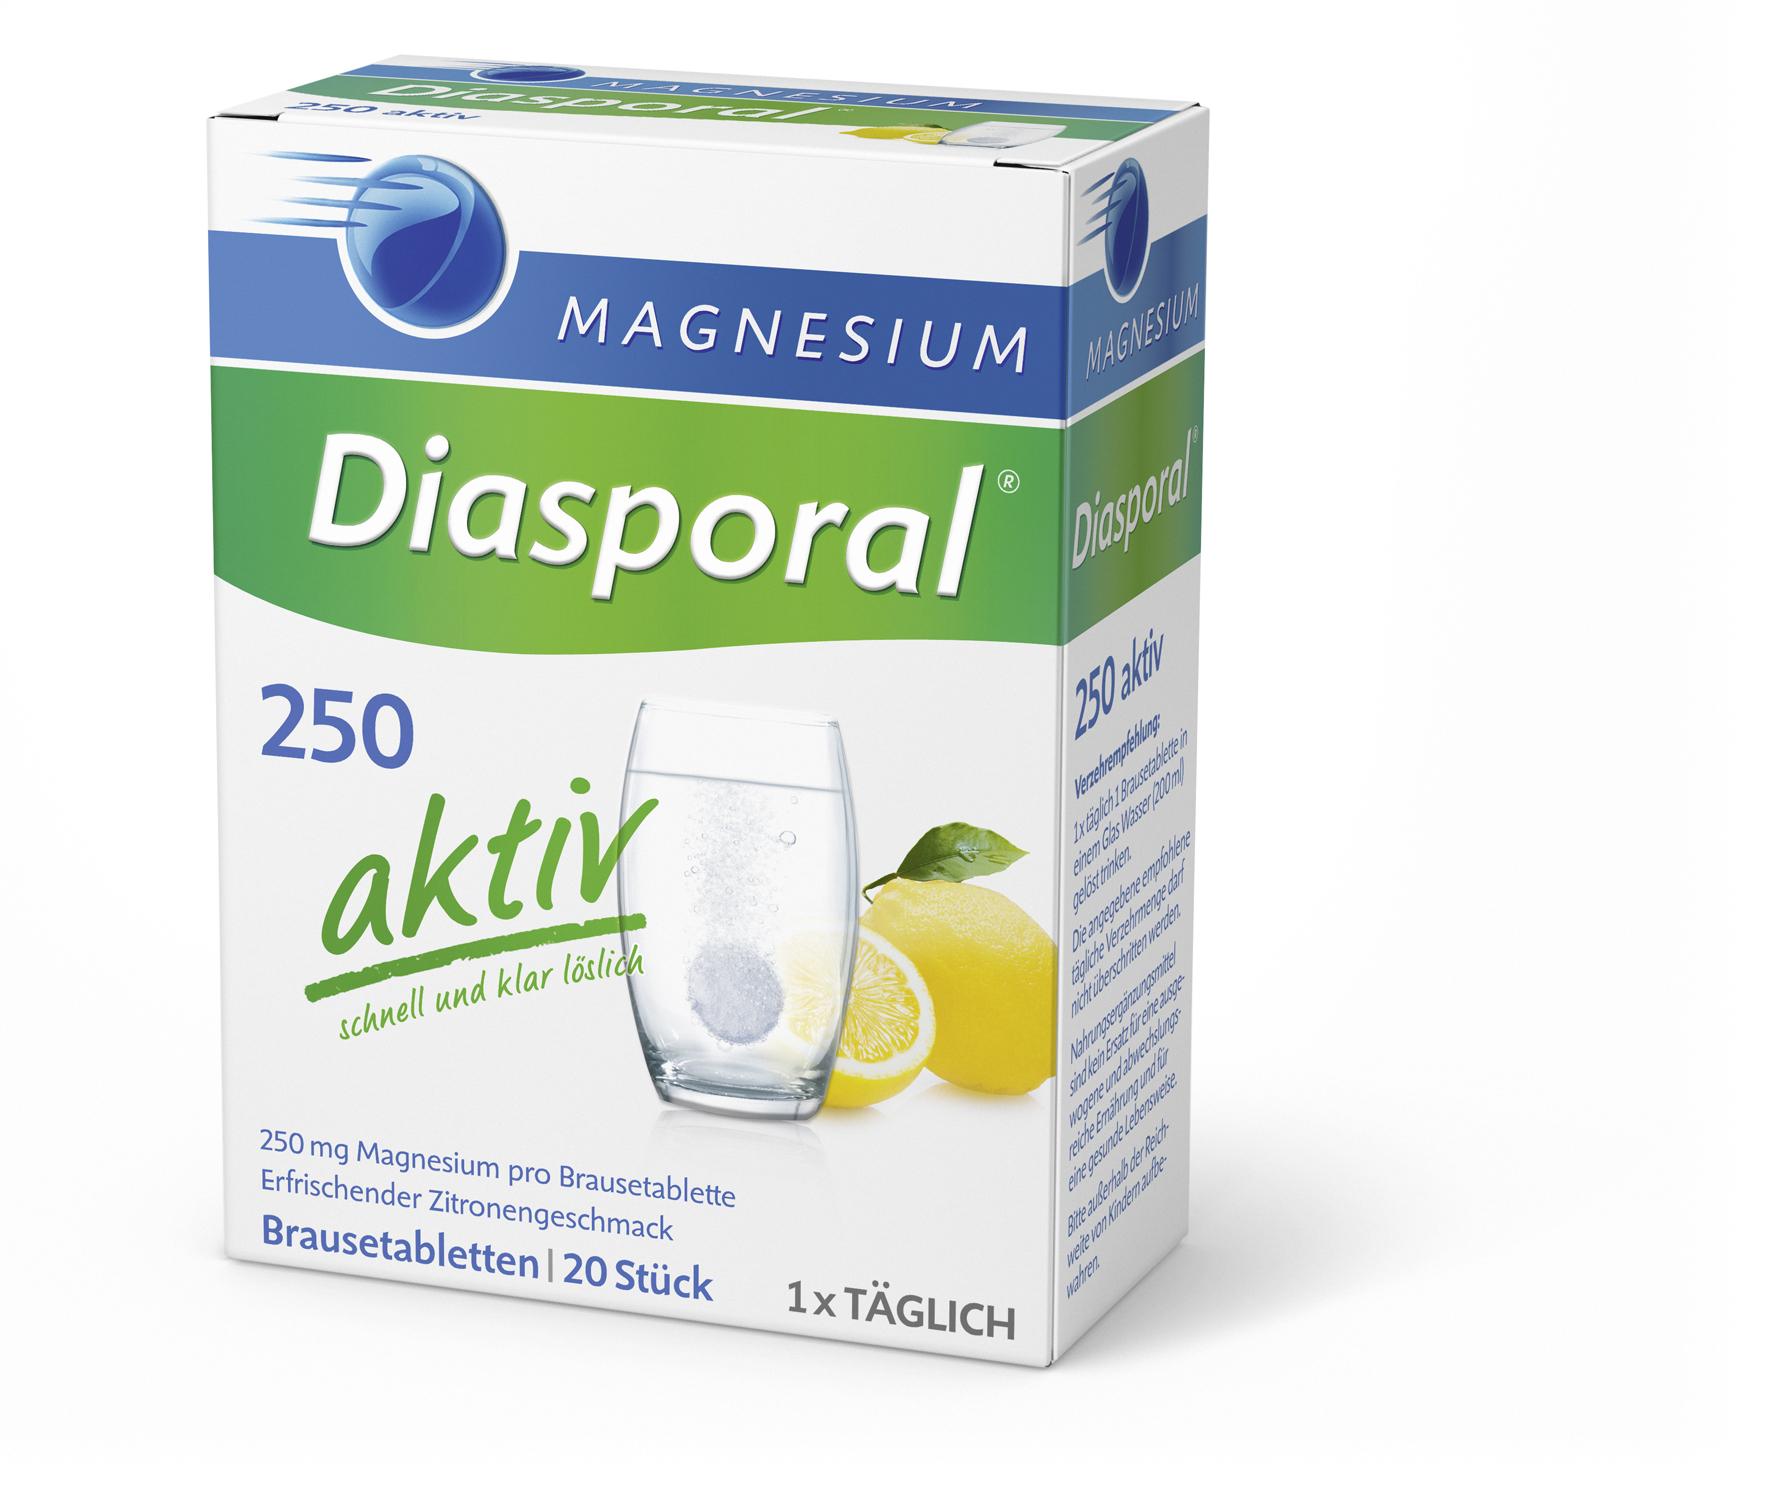 Magnesium Diasporal 250 aktiv 20